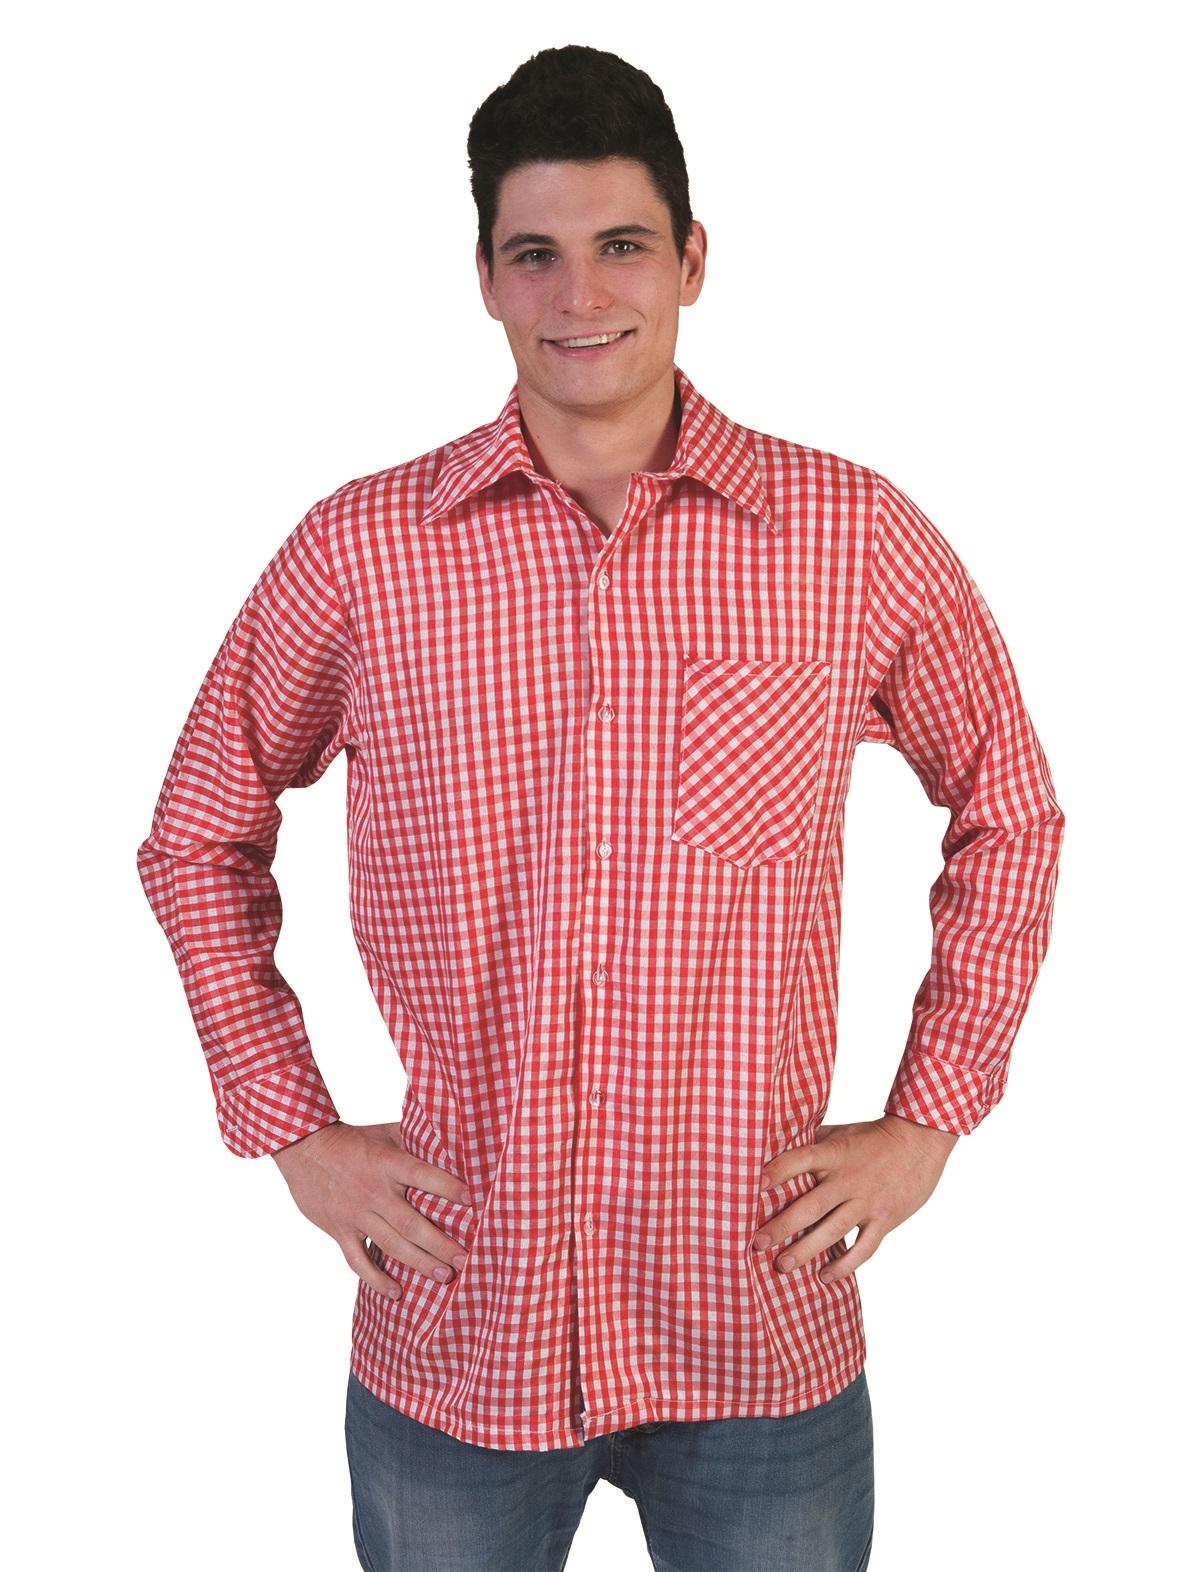 Tirolerhemd rot-weiß